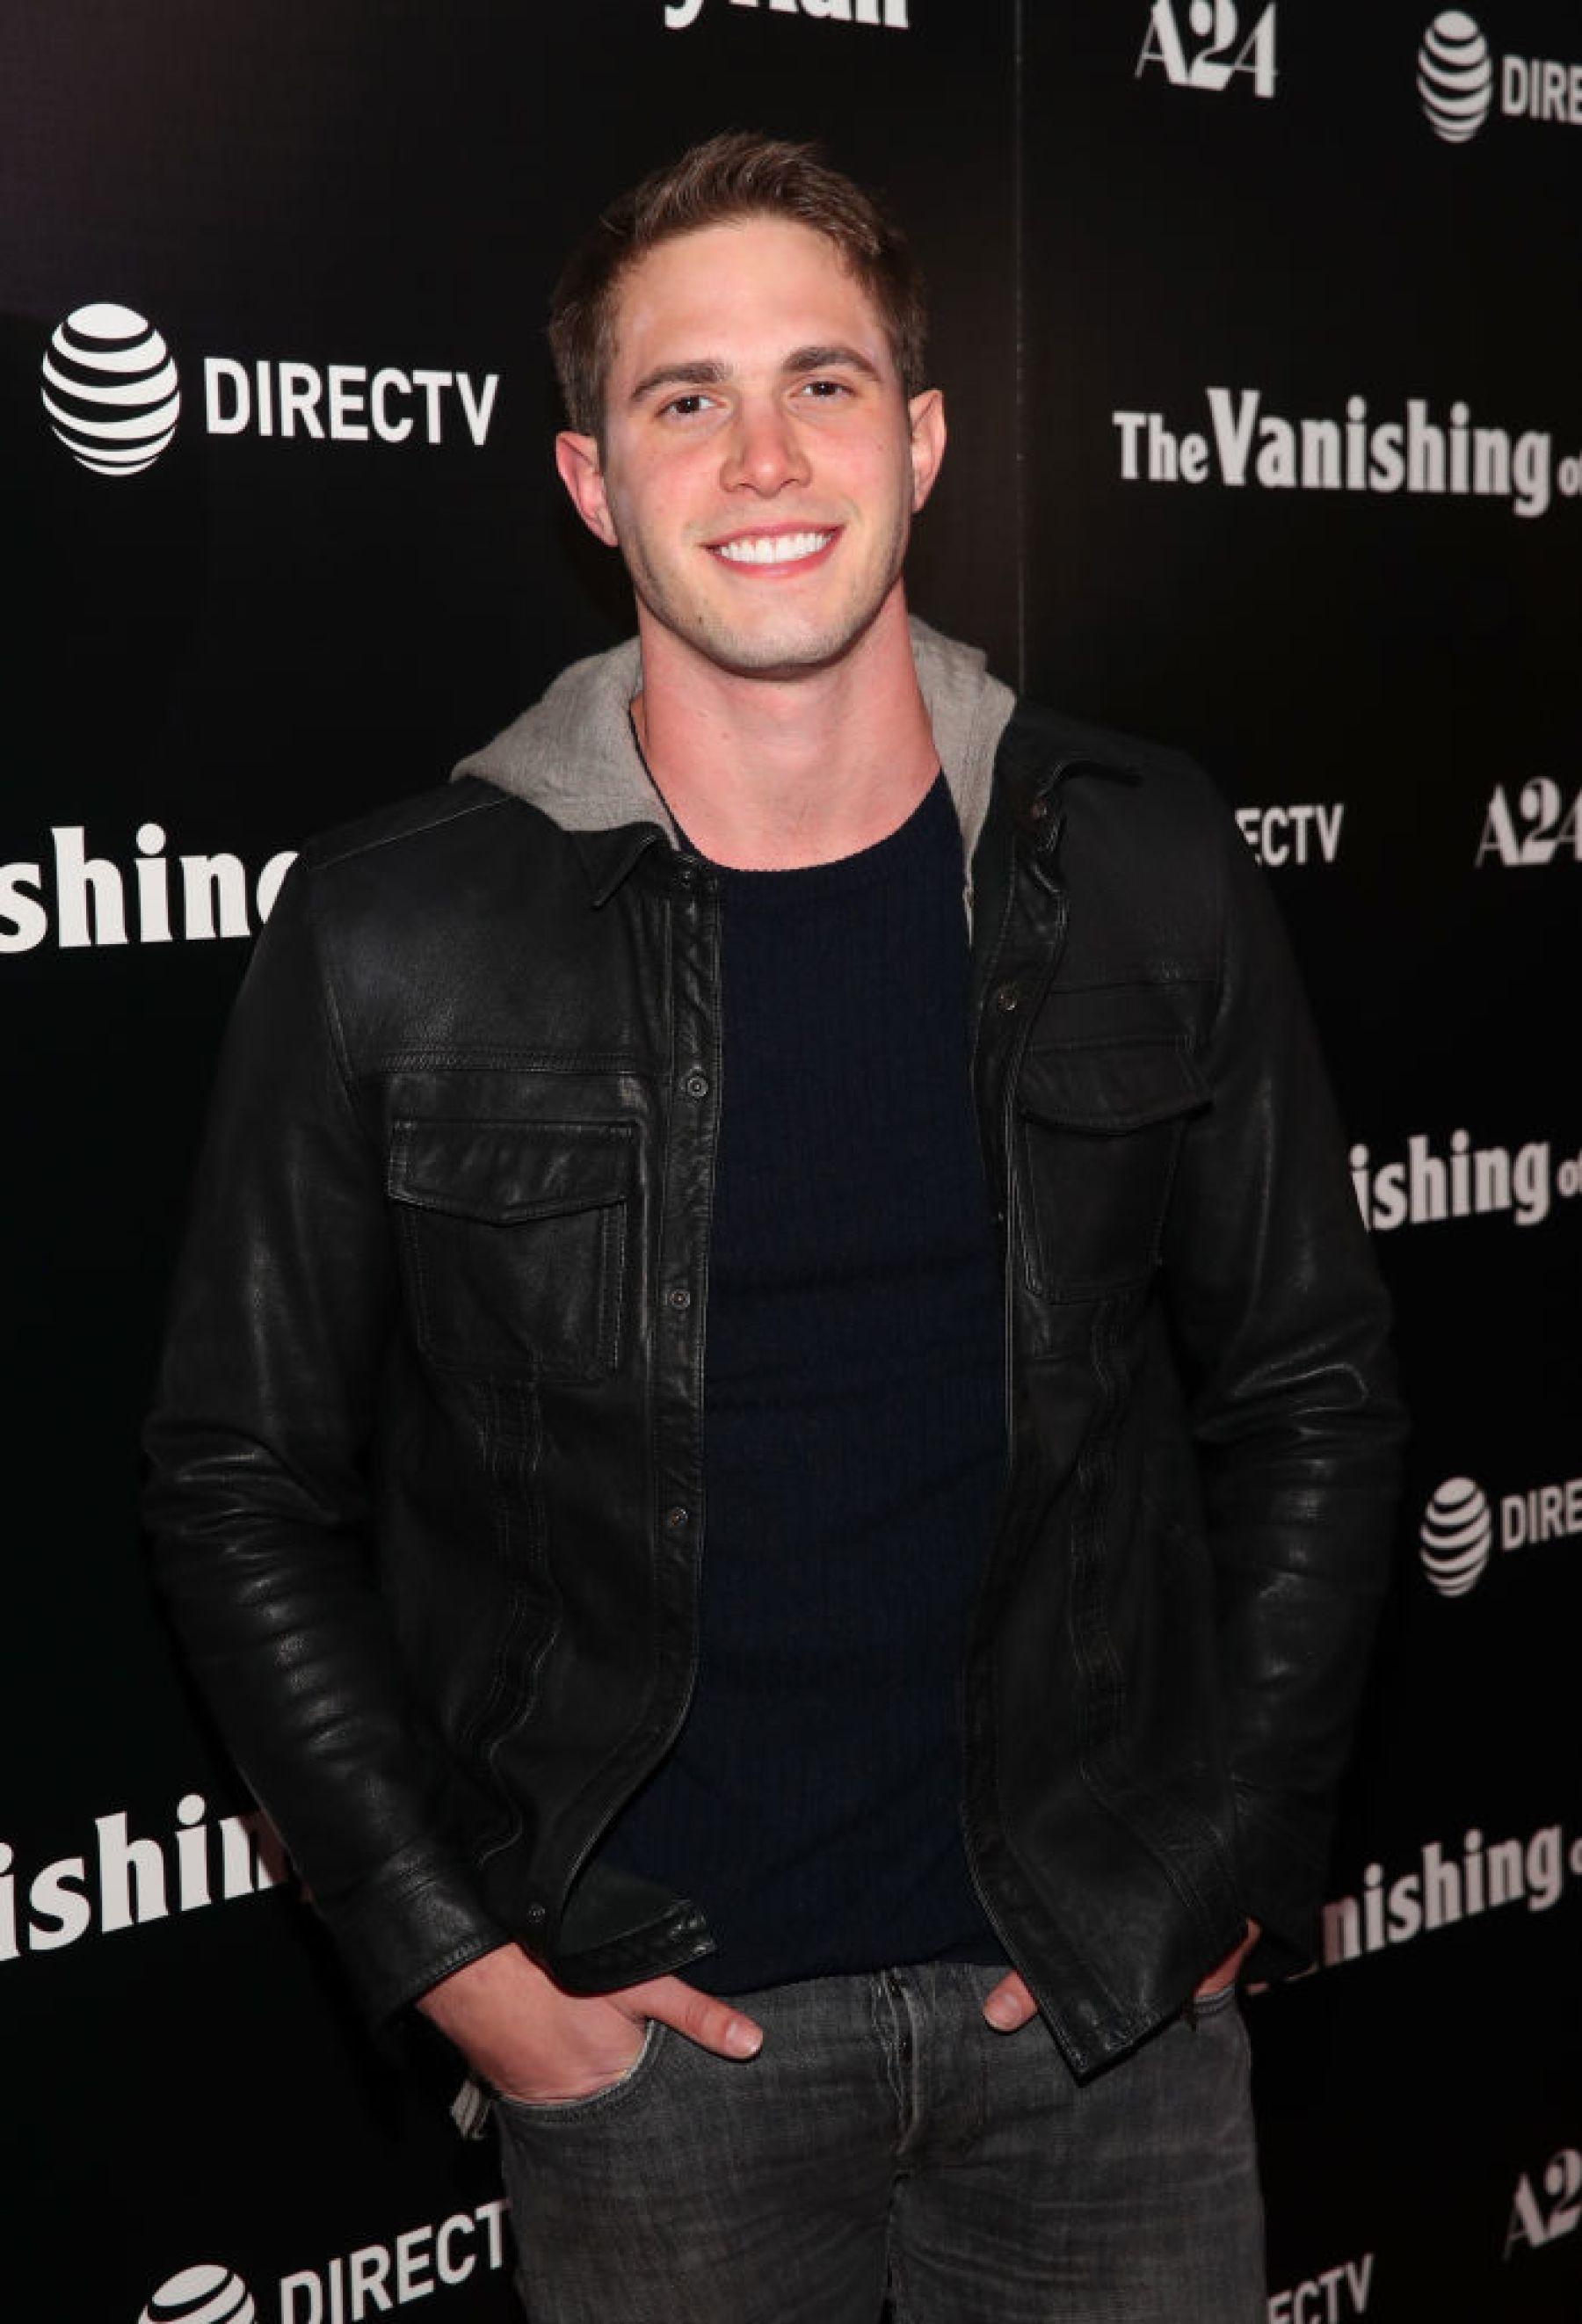 Blake Jenner admitió haber golpeado a su mujer